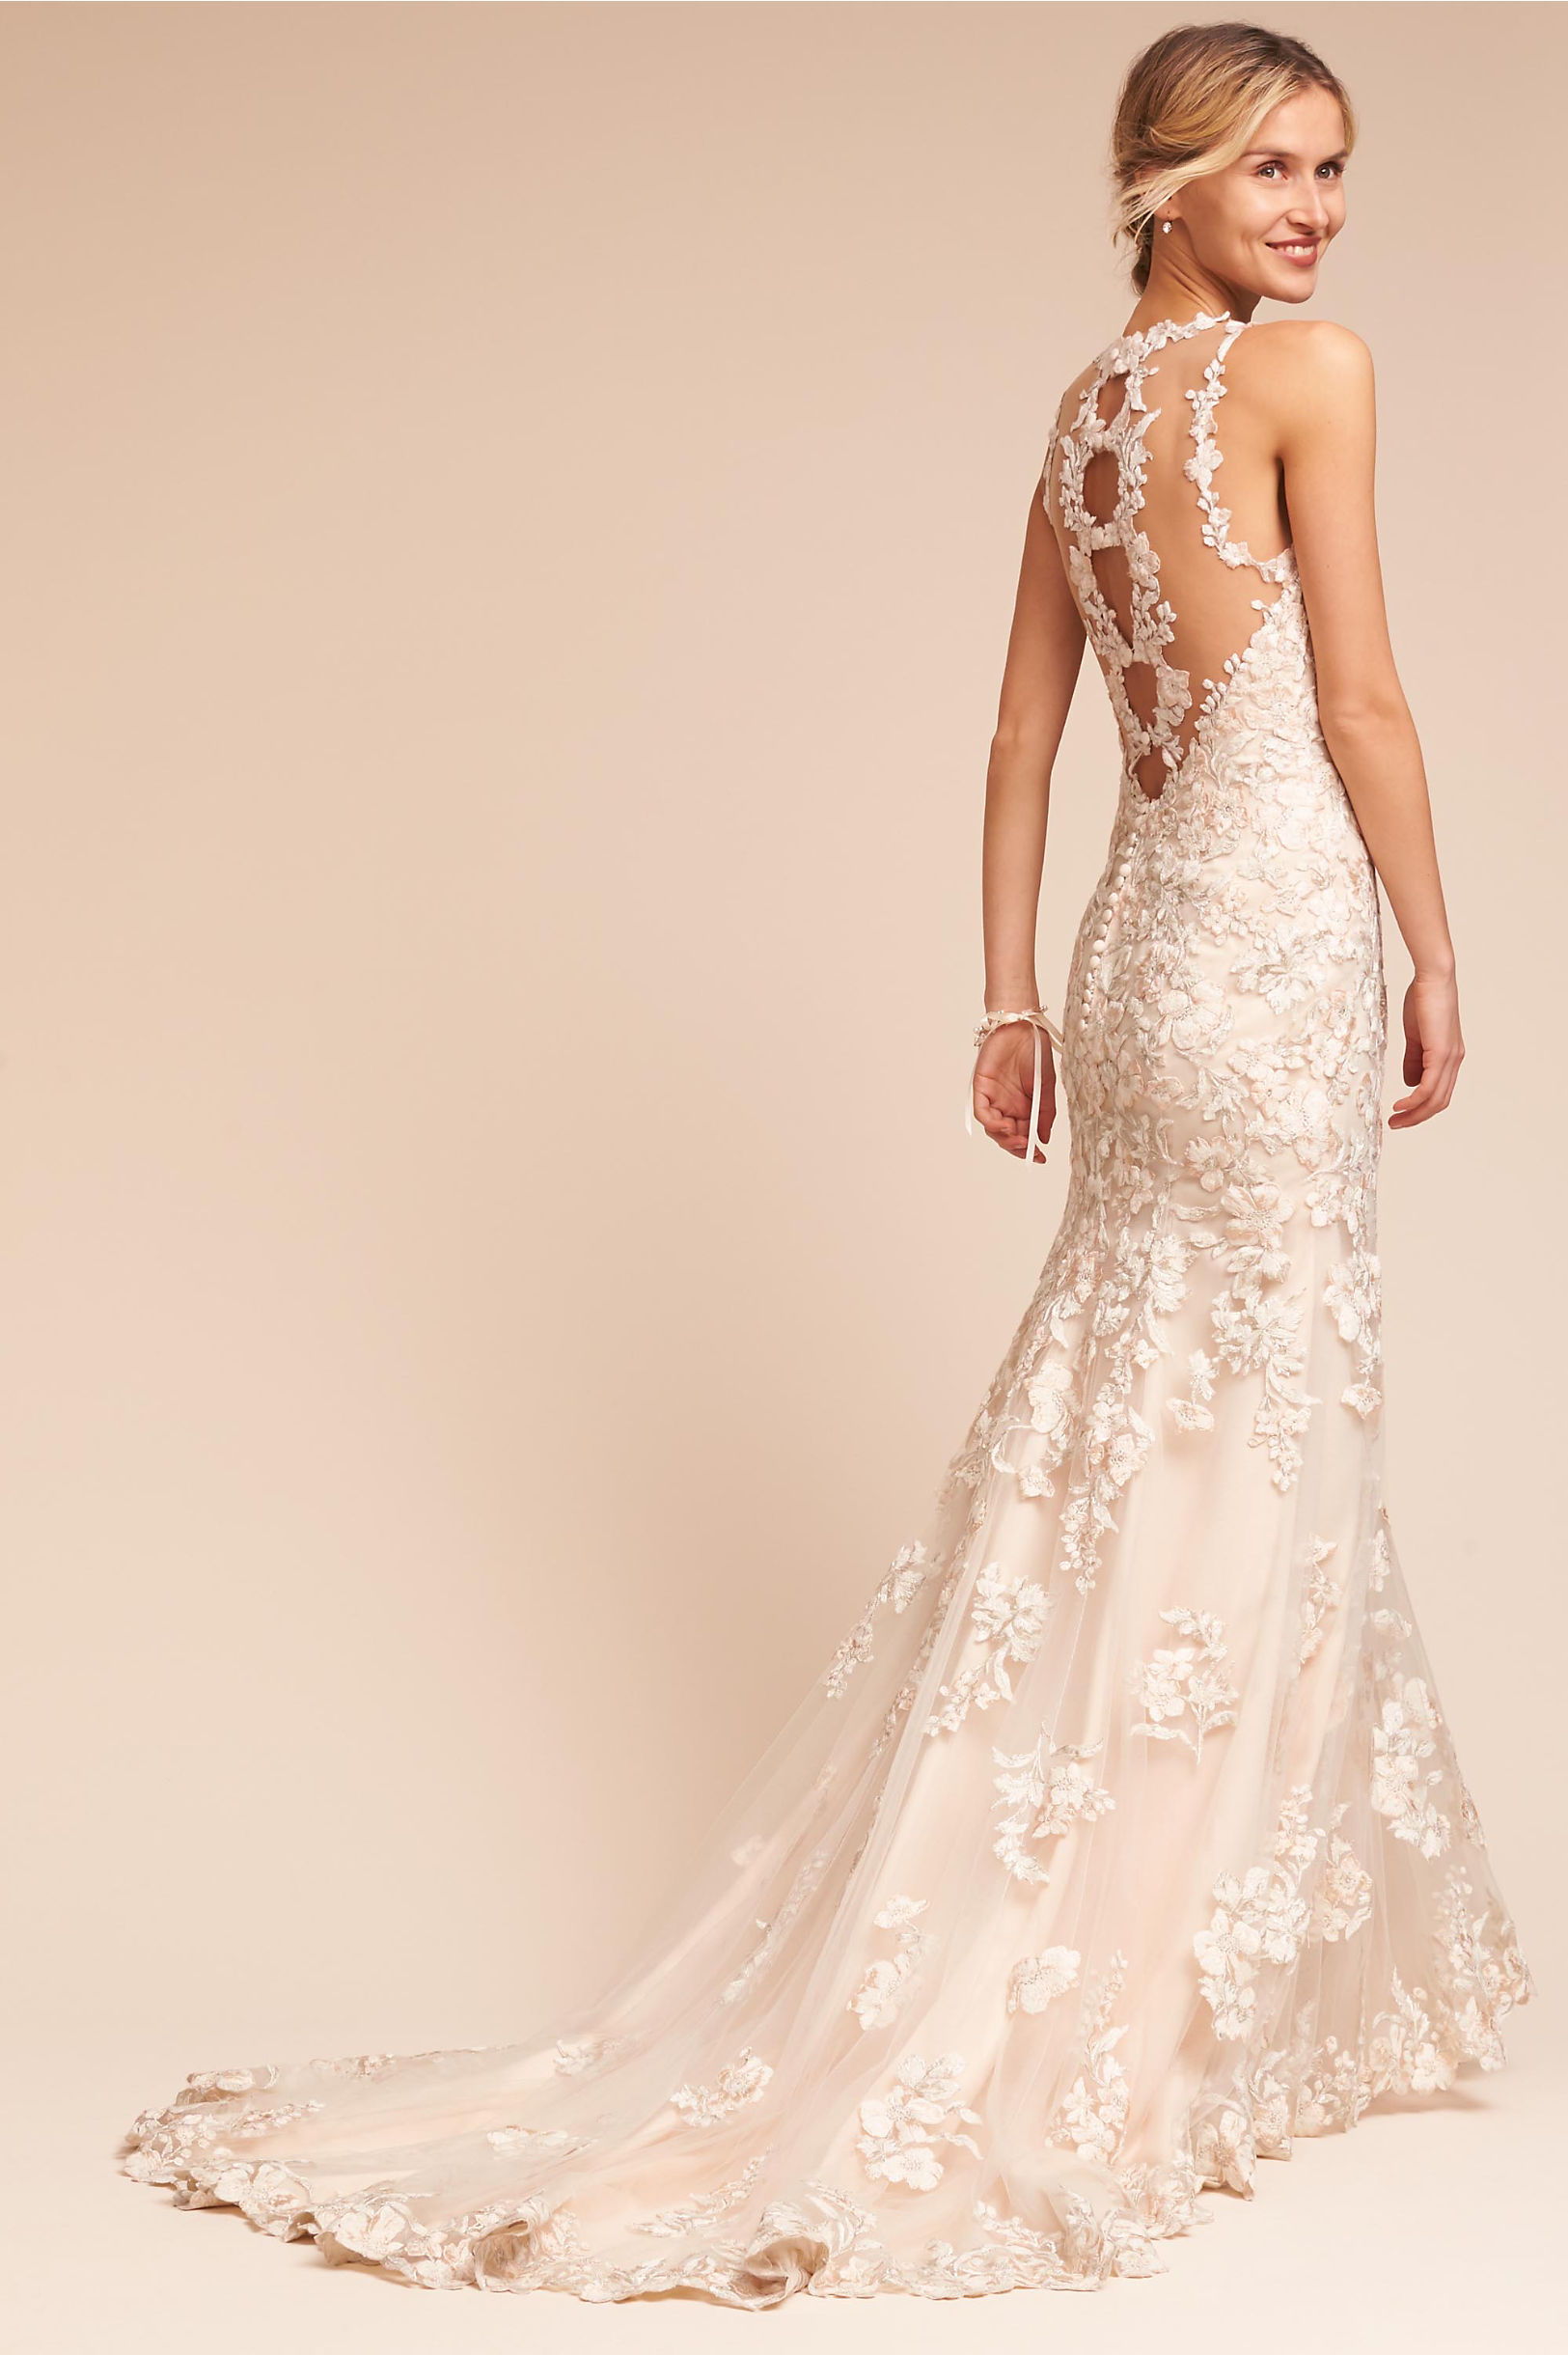 Nouveau gown in sale bhldn ivory nouveau gown bhldn ombrellifo Images